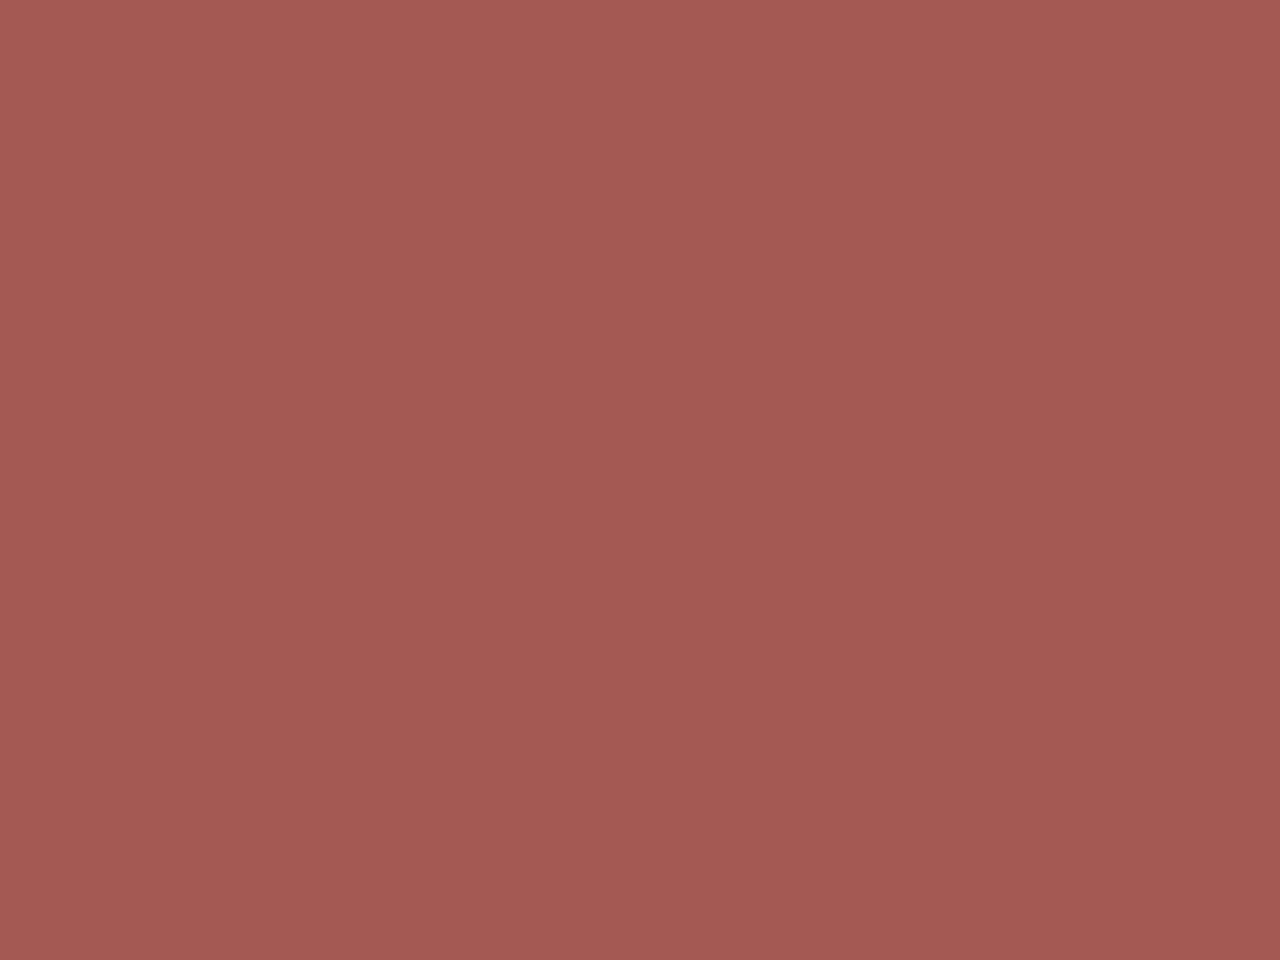 1280x960 Redwood Solid Color Background